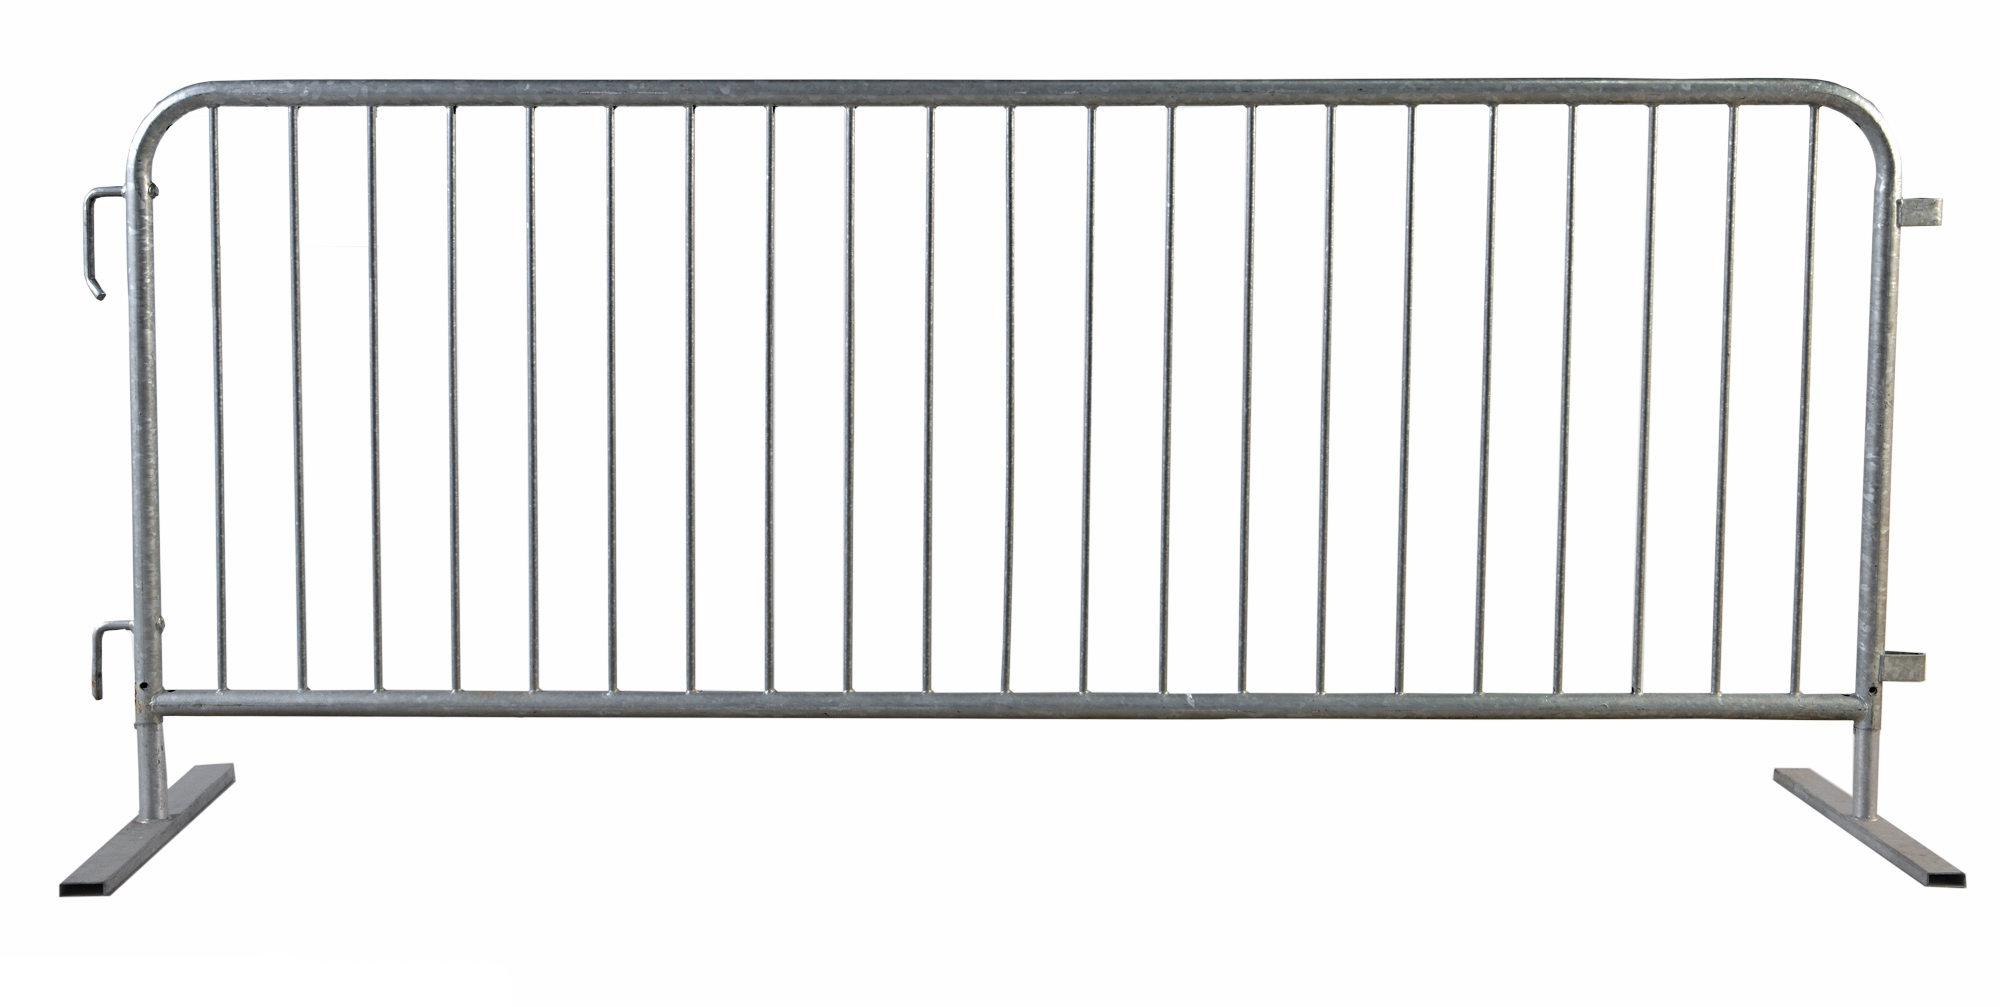 Site Barricades Pedestrian Steel Barricade